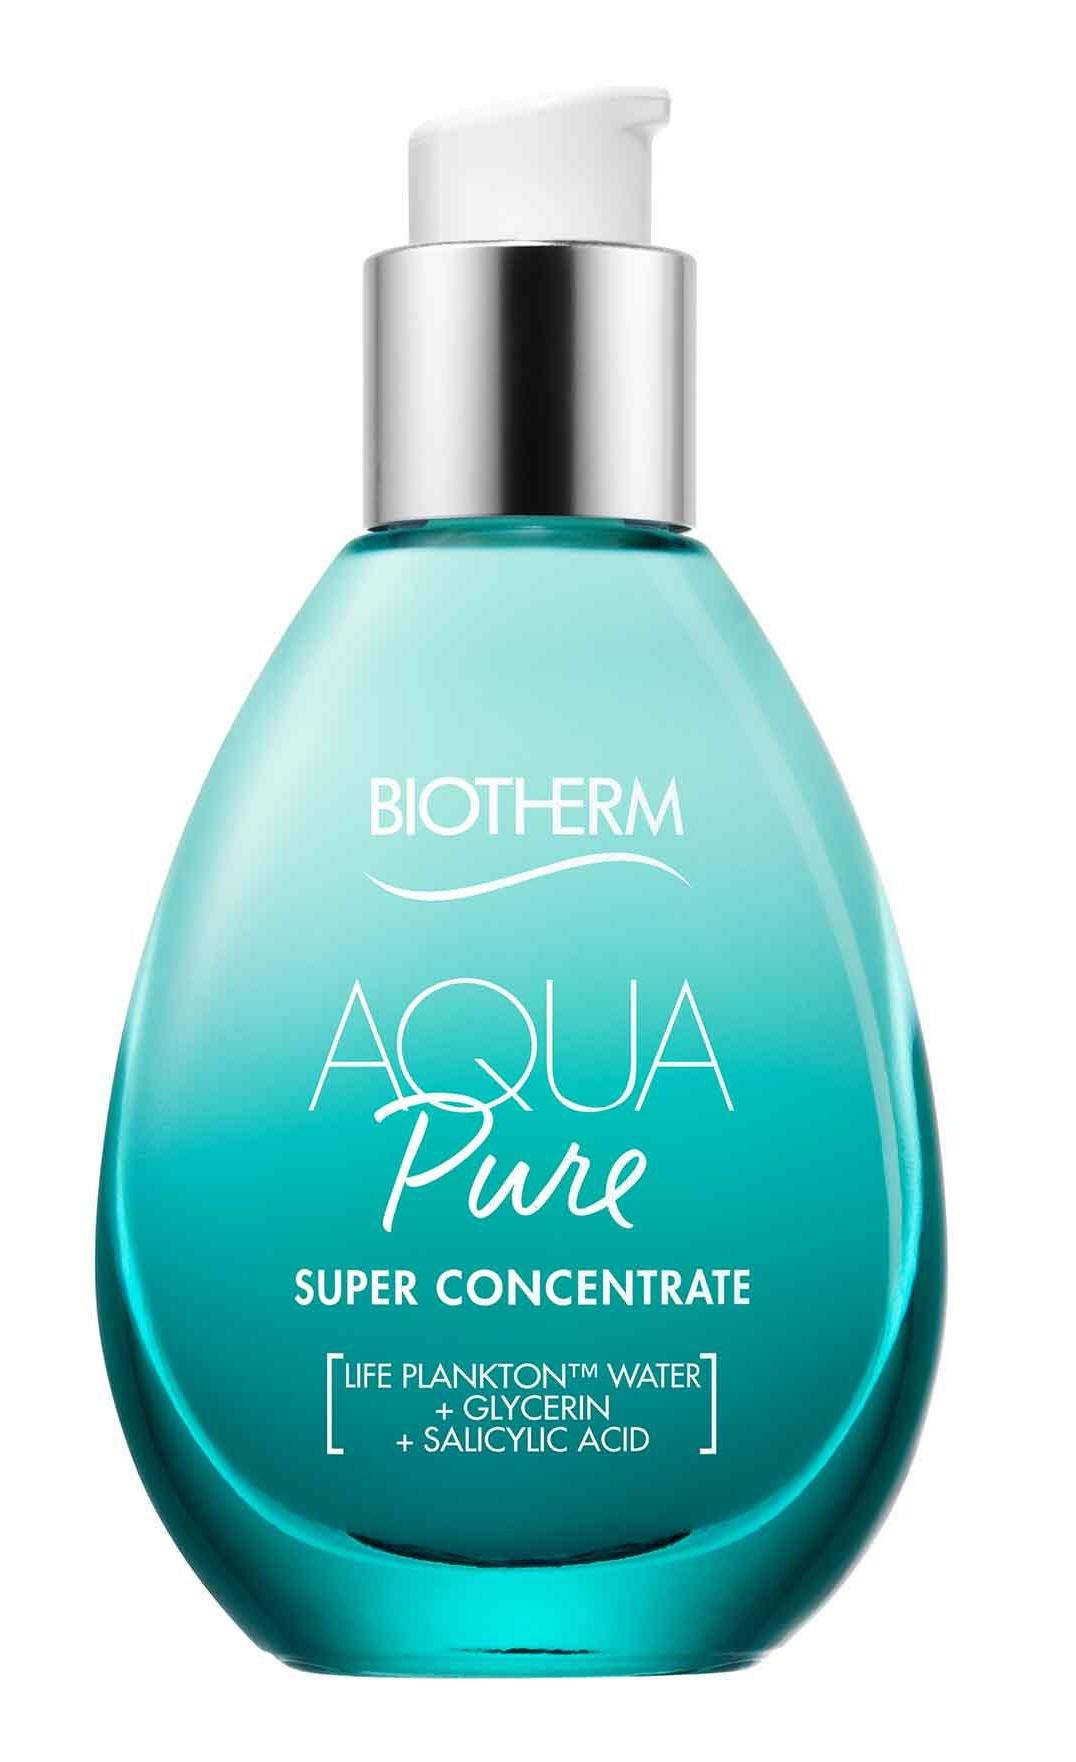 Biotherm Aqua Pure Super Concentrate